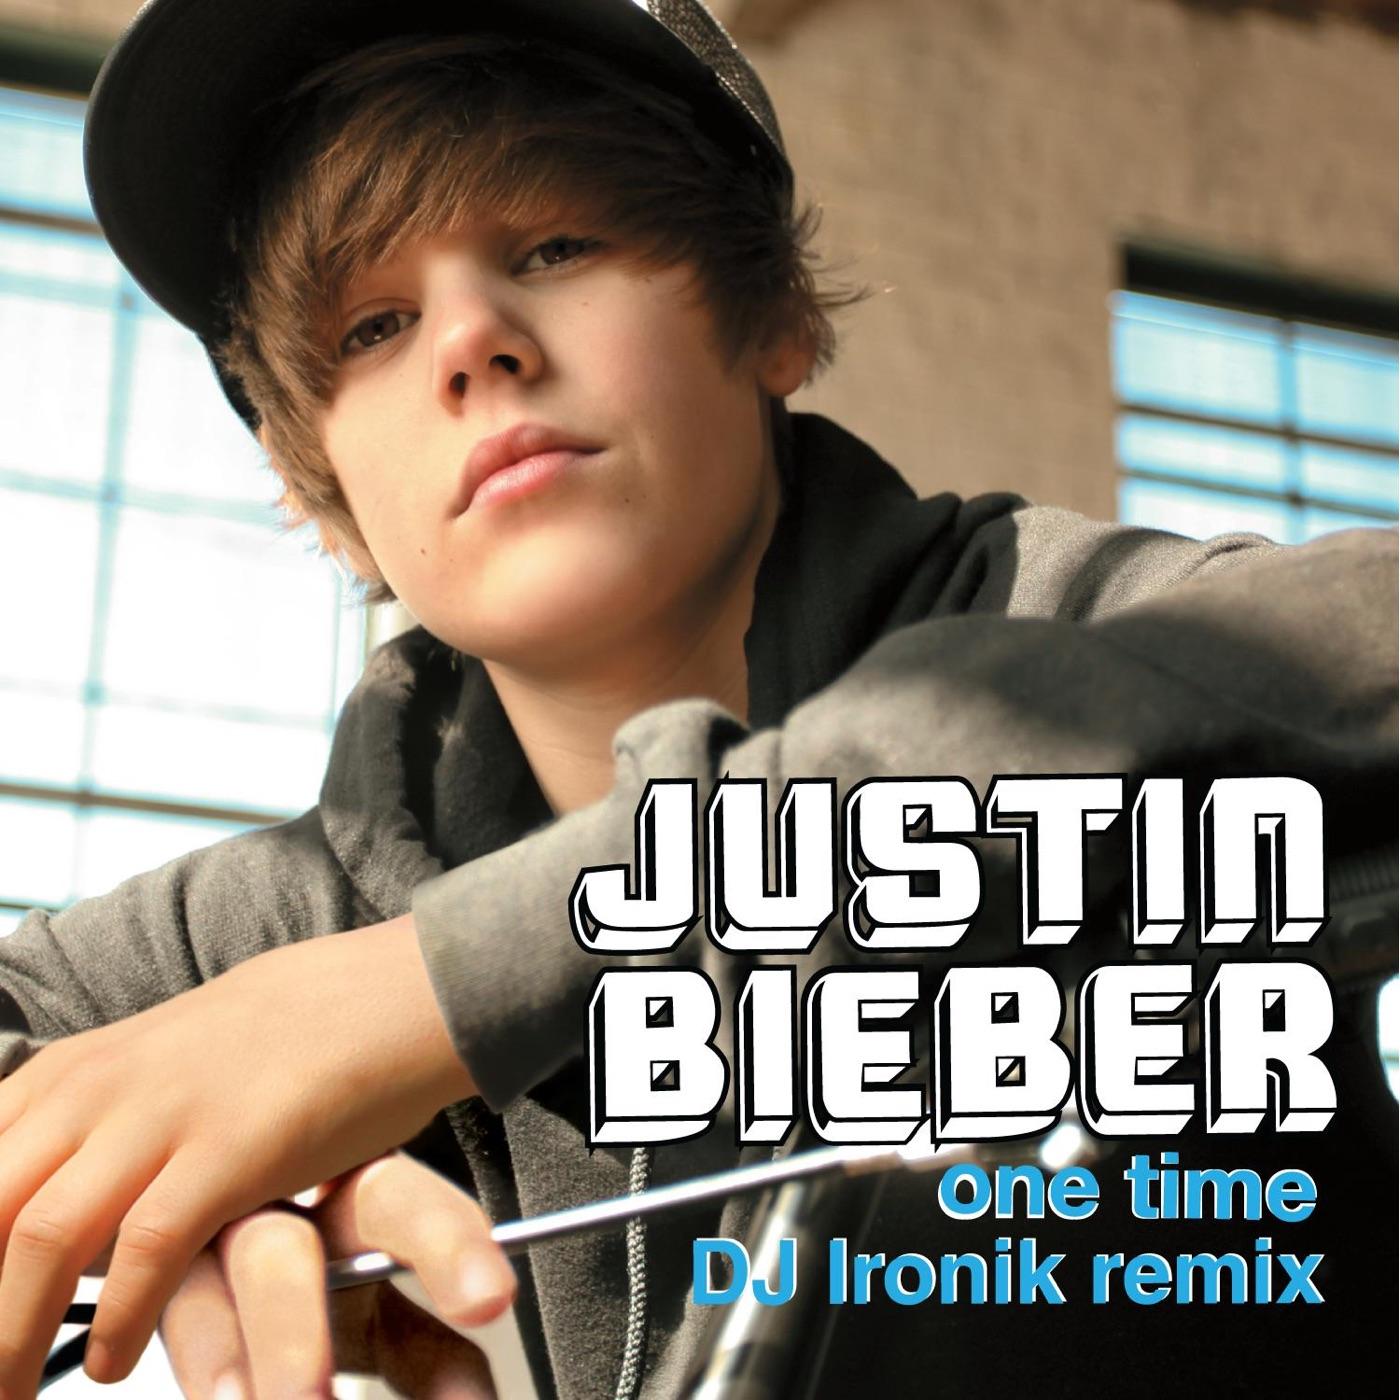 Justin Bieber - One Time (DJ Ironik Remix) - Single Cover